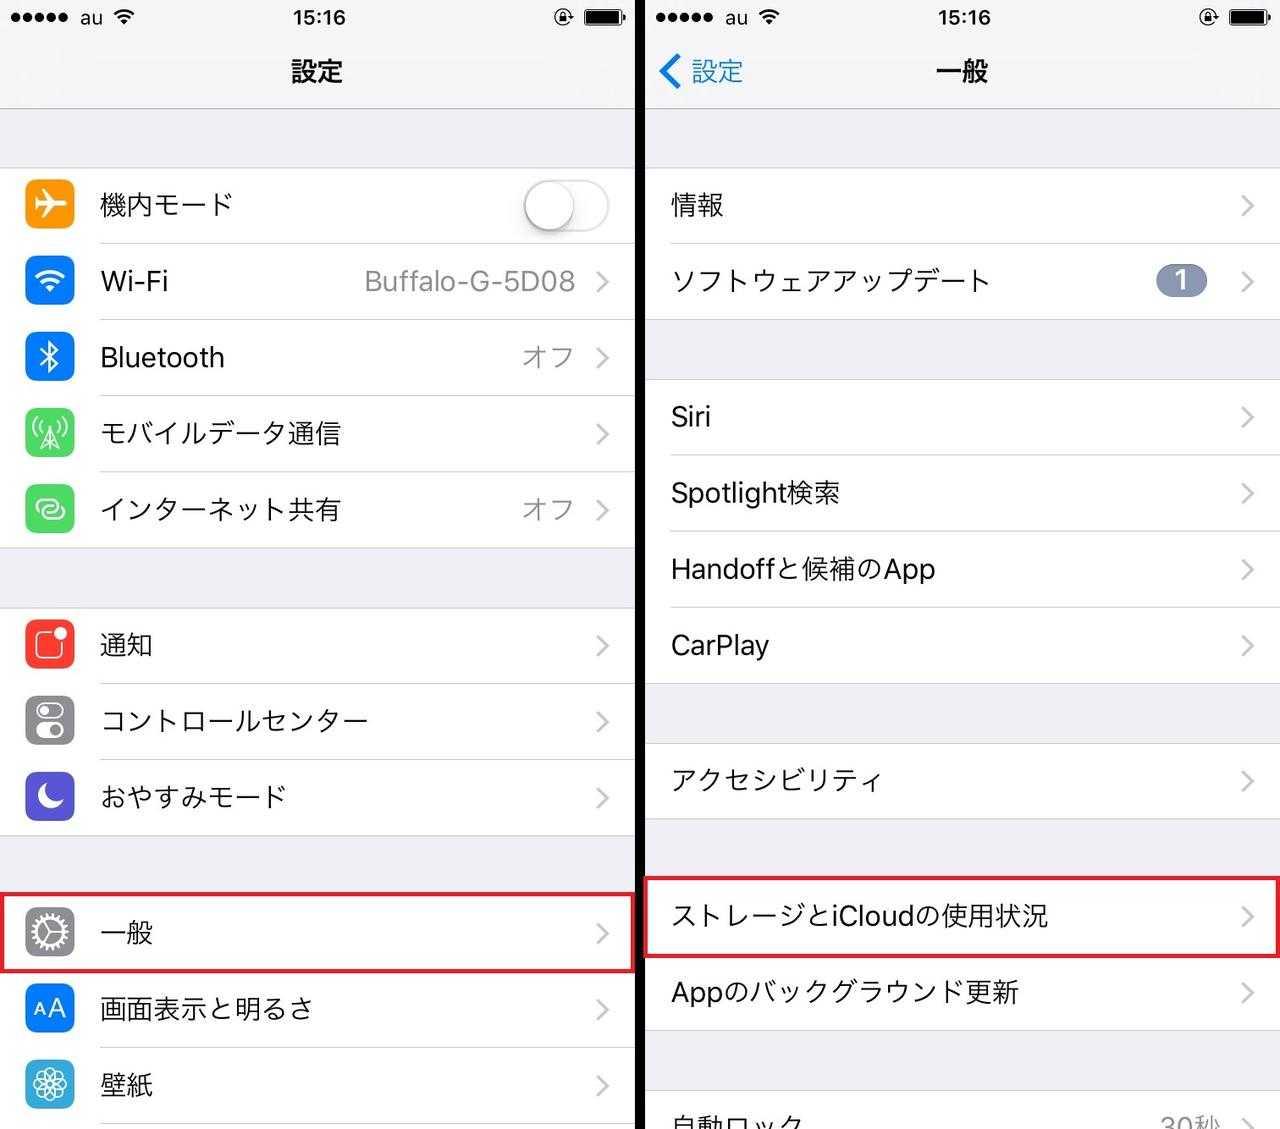 Iphoneで容量の大きいアプリを特定し効率良く削除する小ワザ Iphone Tips ニュースパス